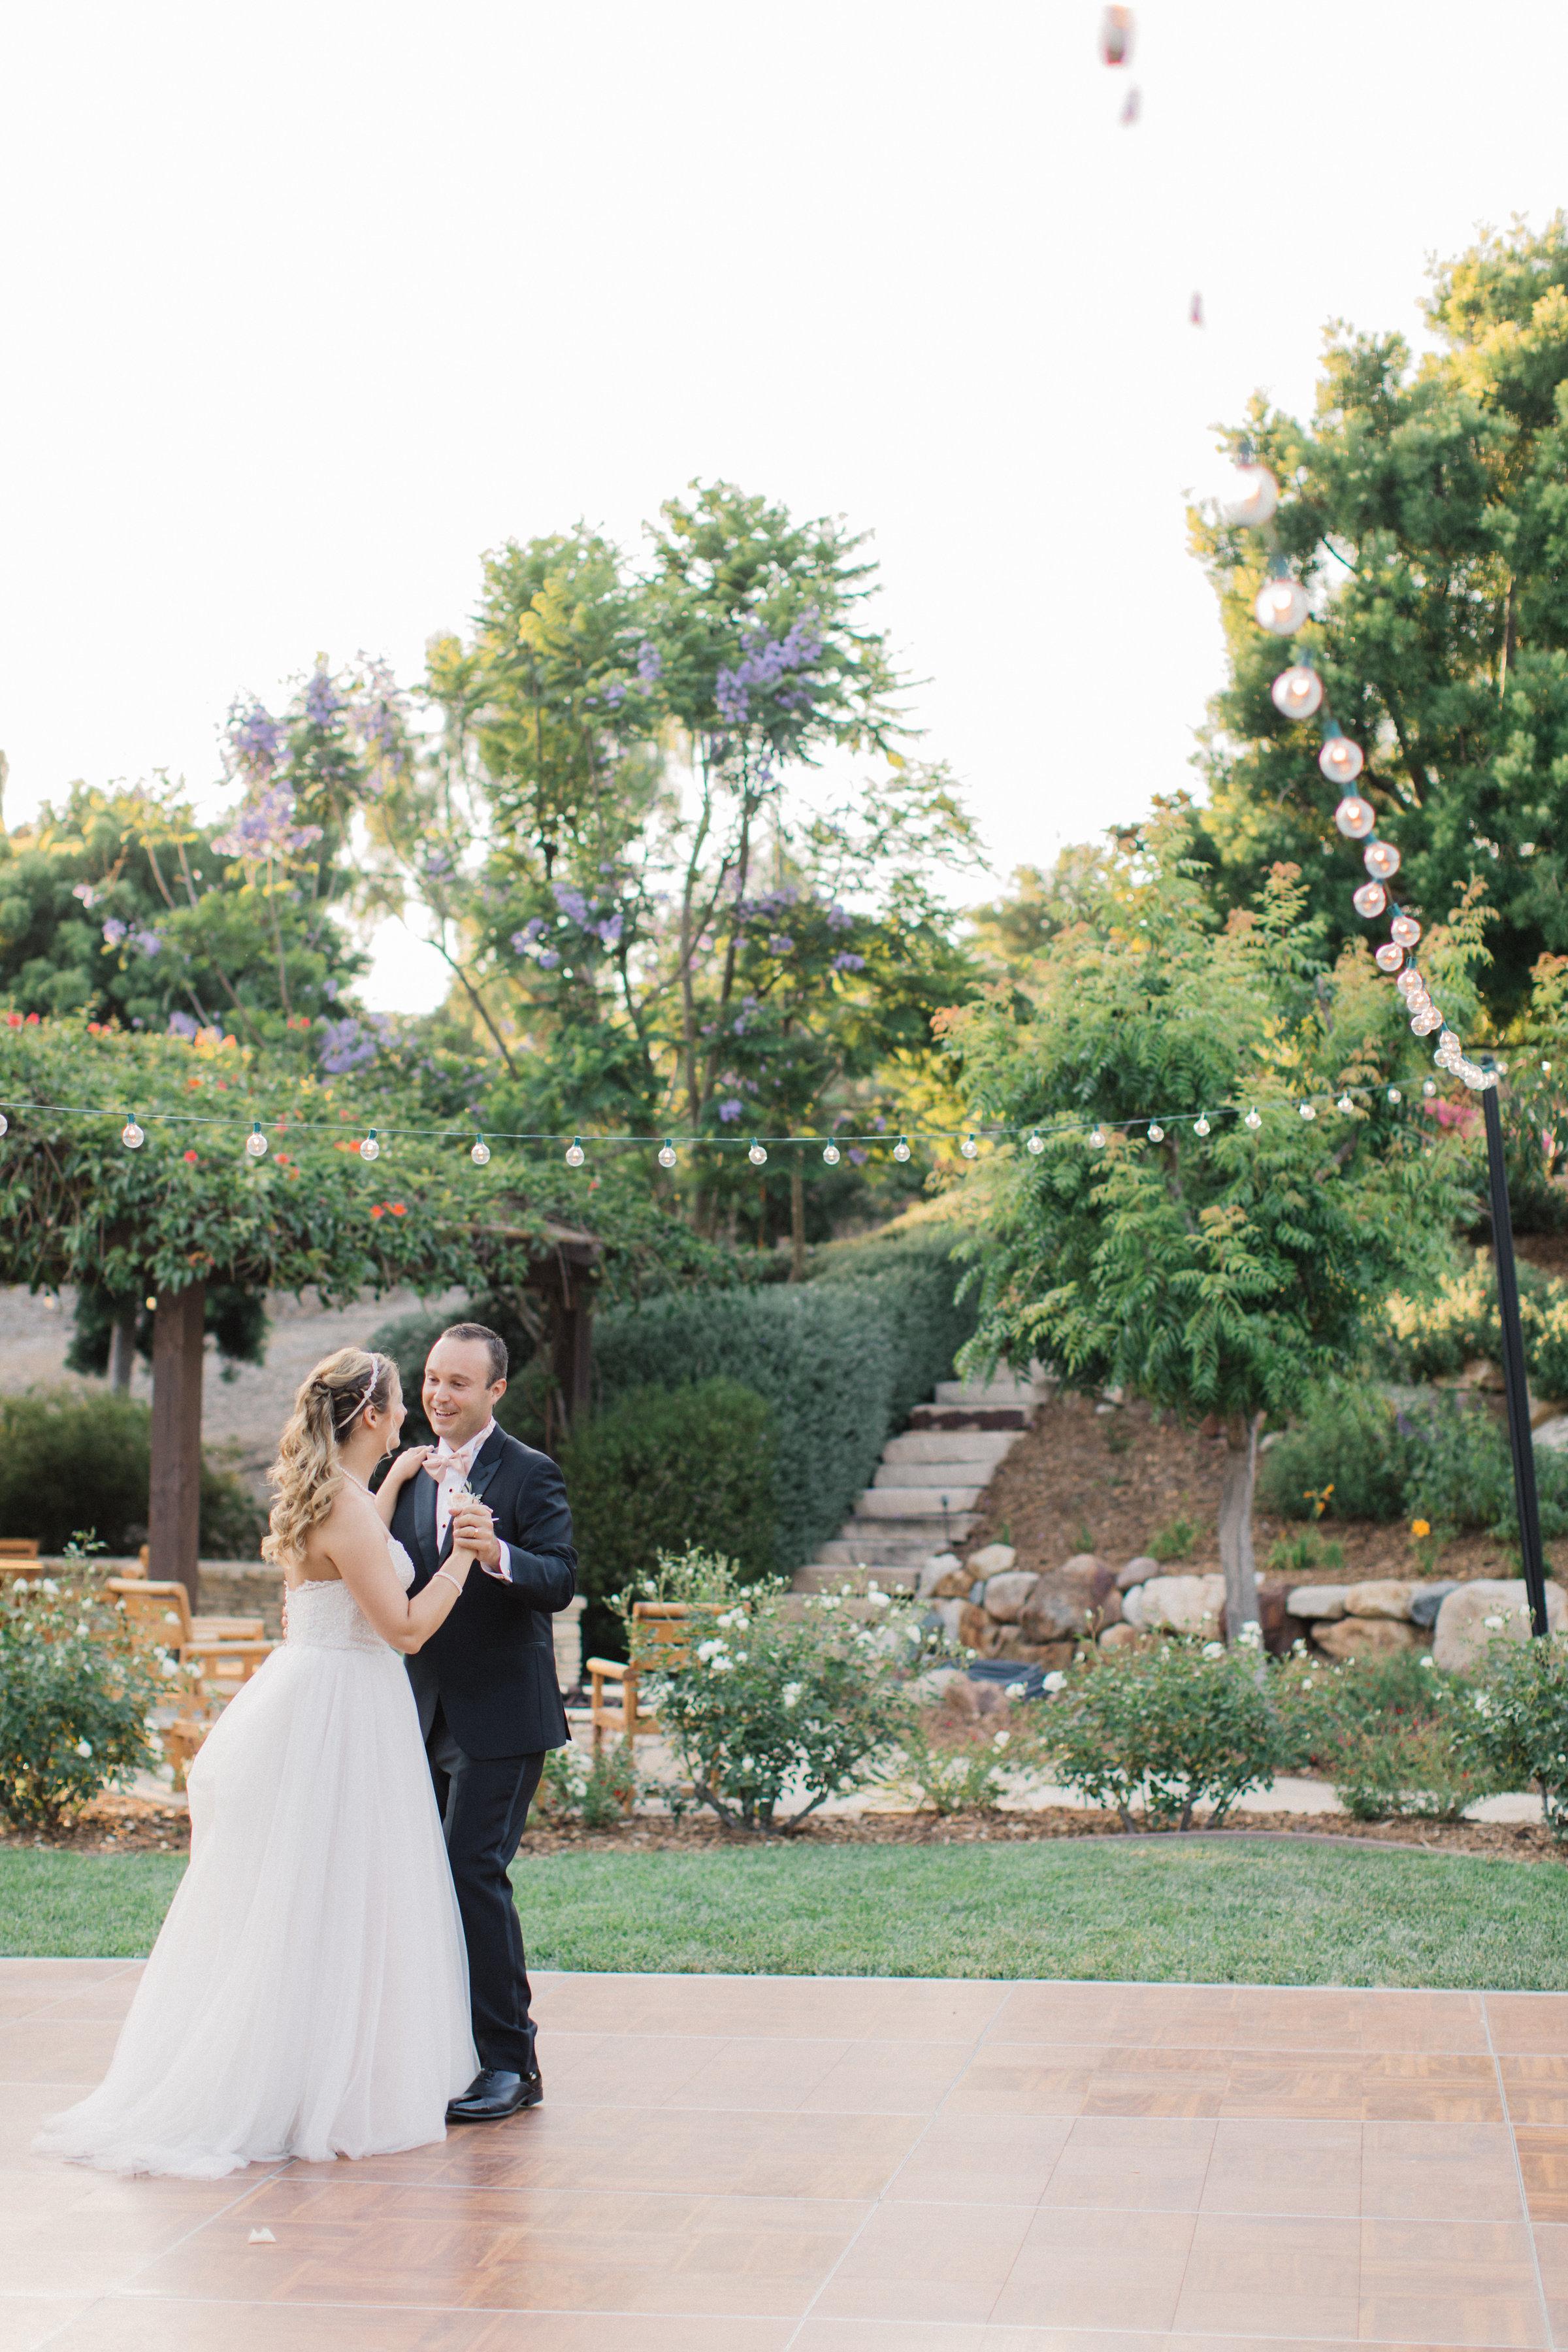 Braden-Hannah-Married-626.jpg